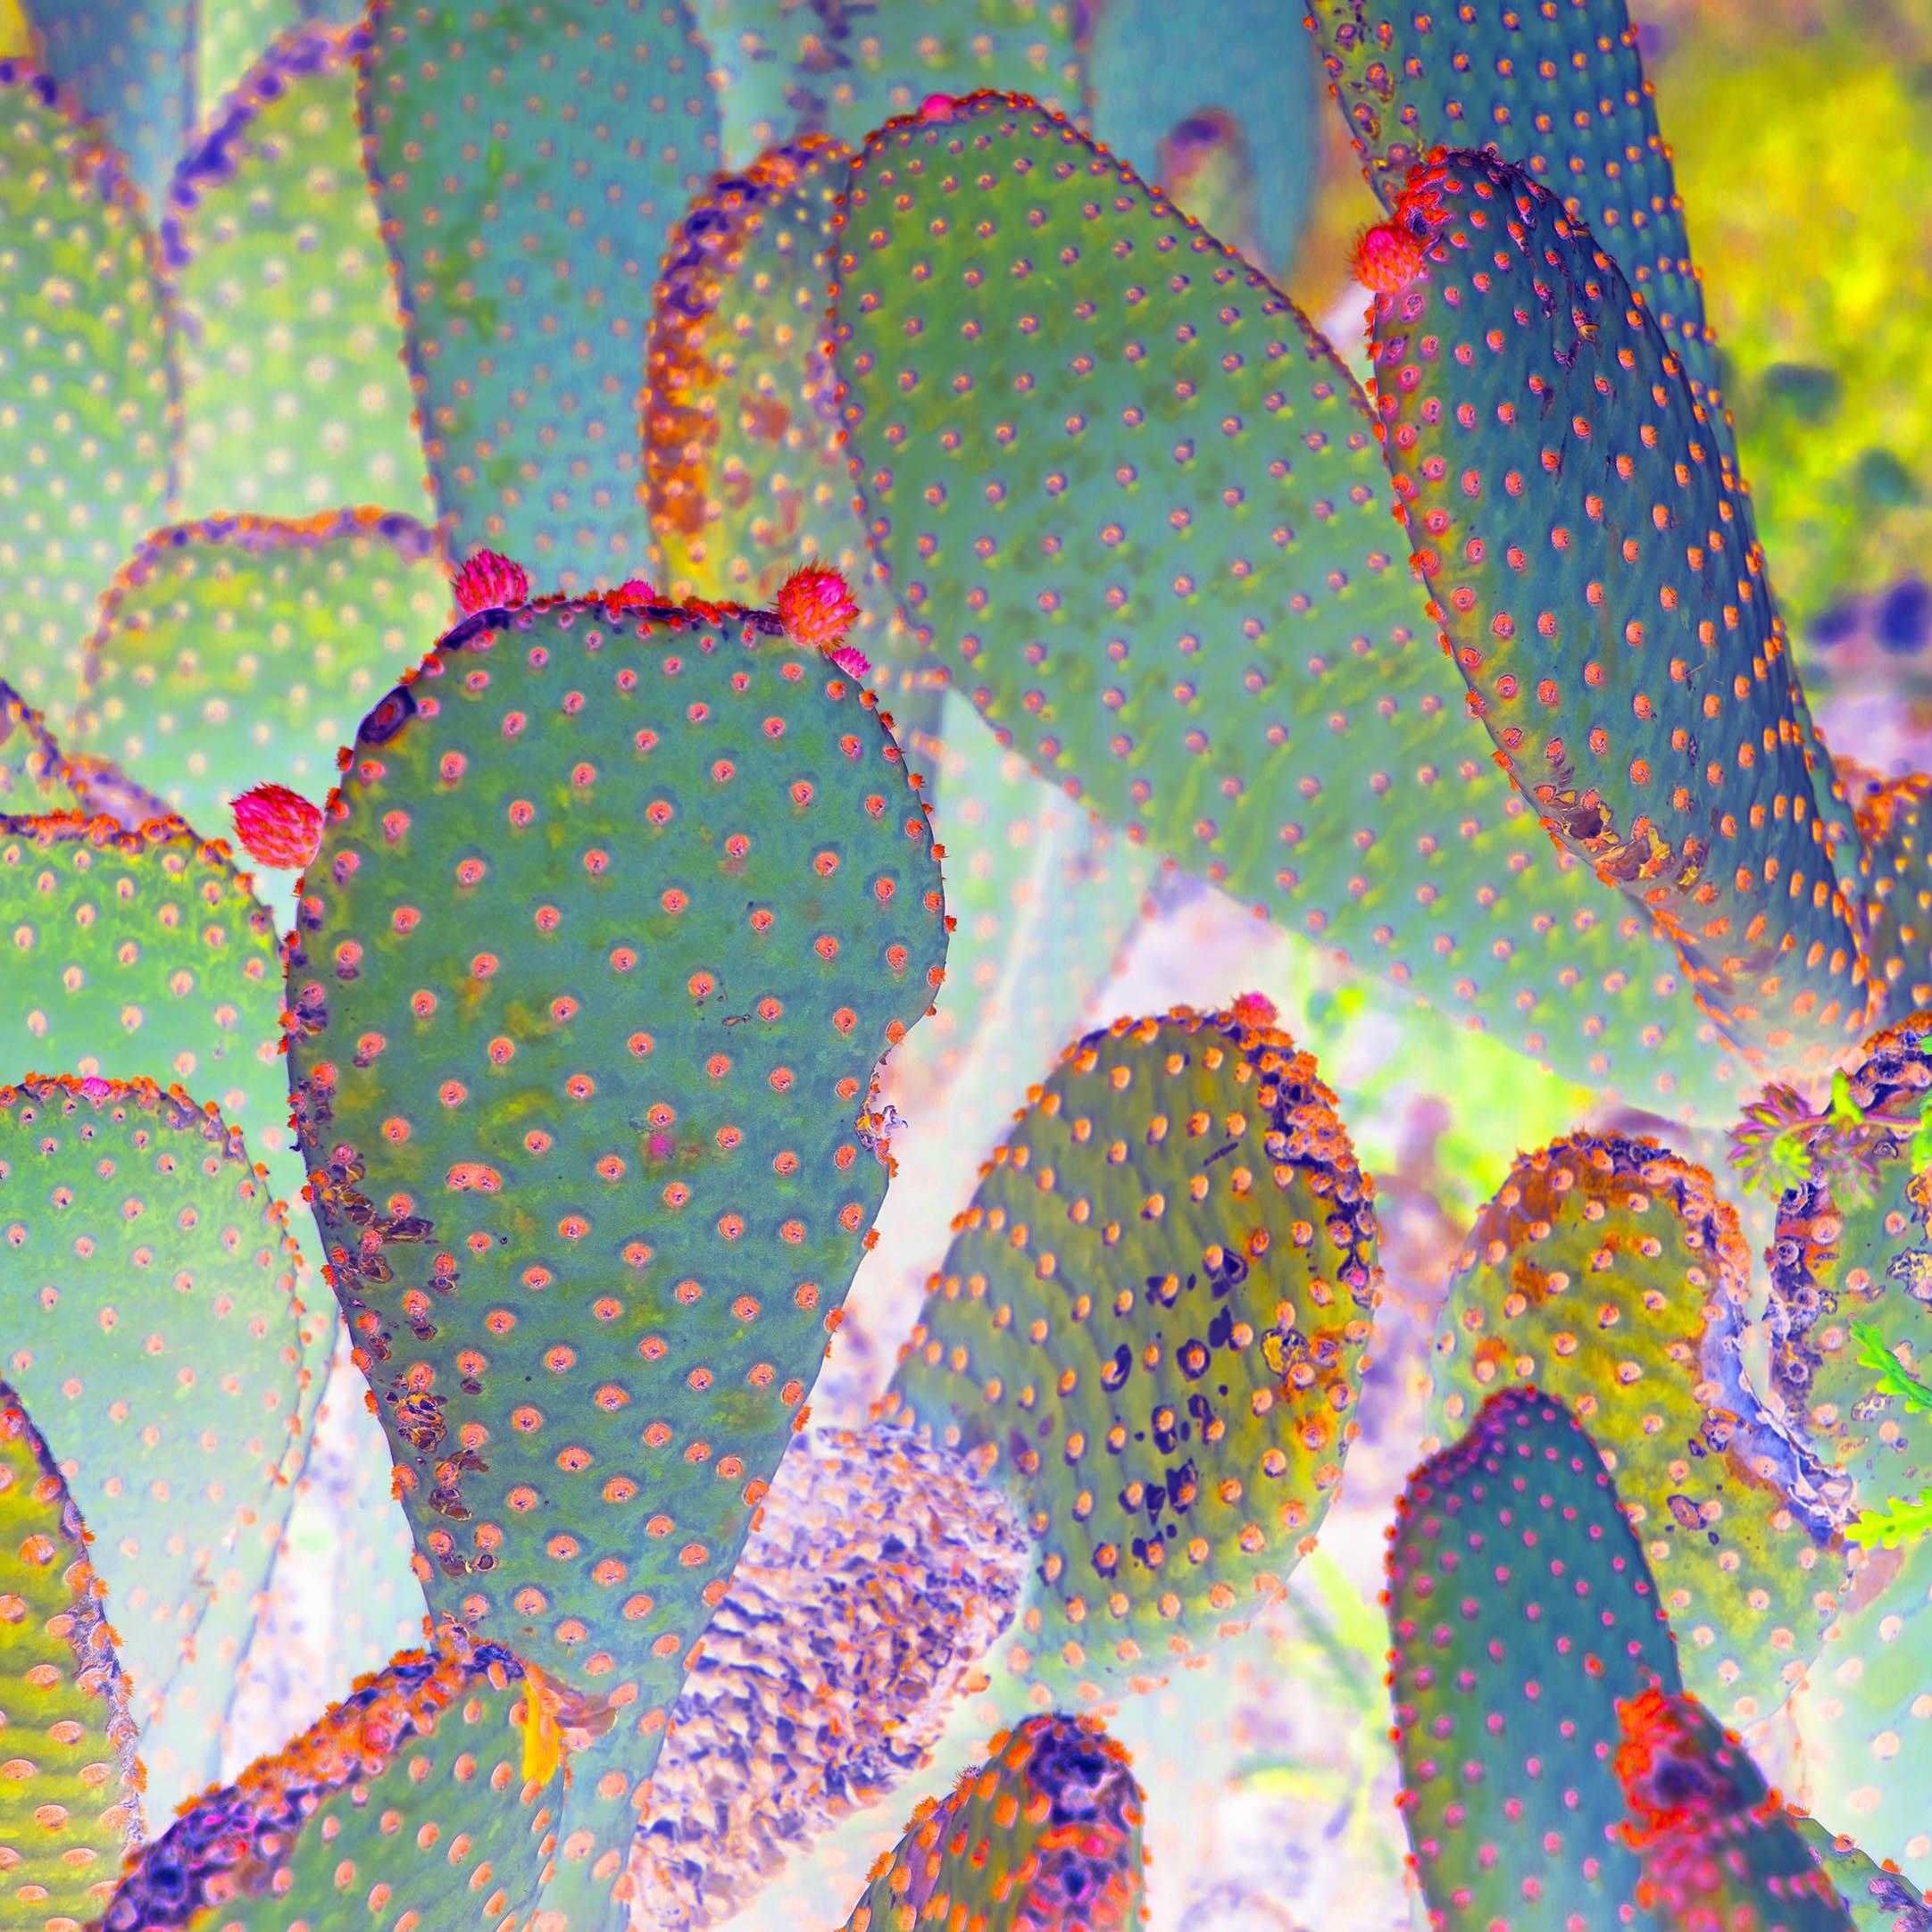 Good morning Cactus!